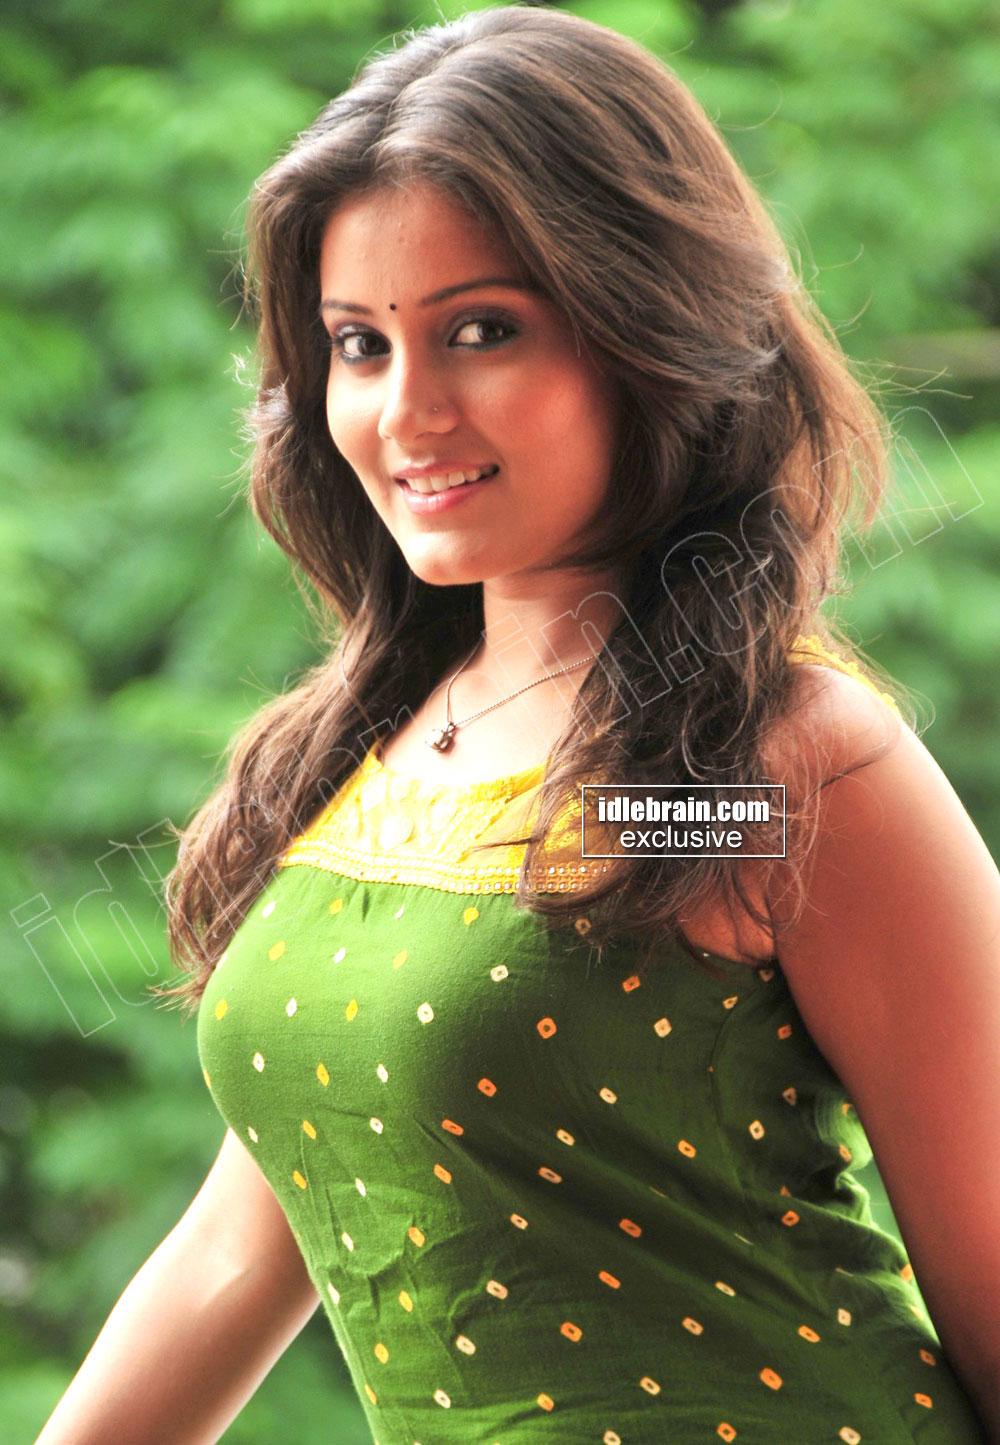 Popular Videos - Archana Gupta - YouTube